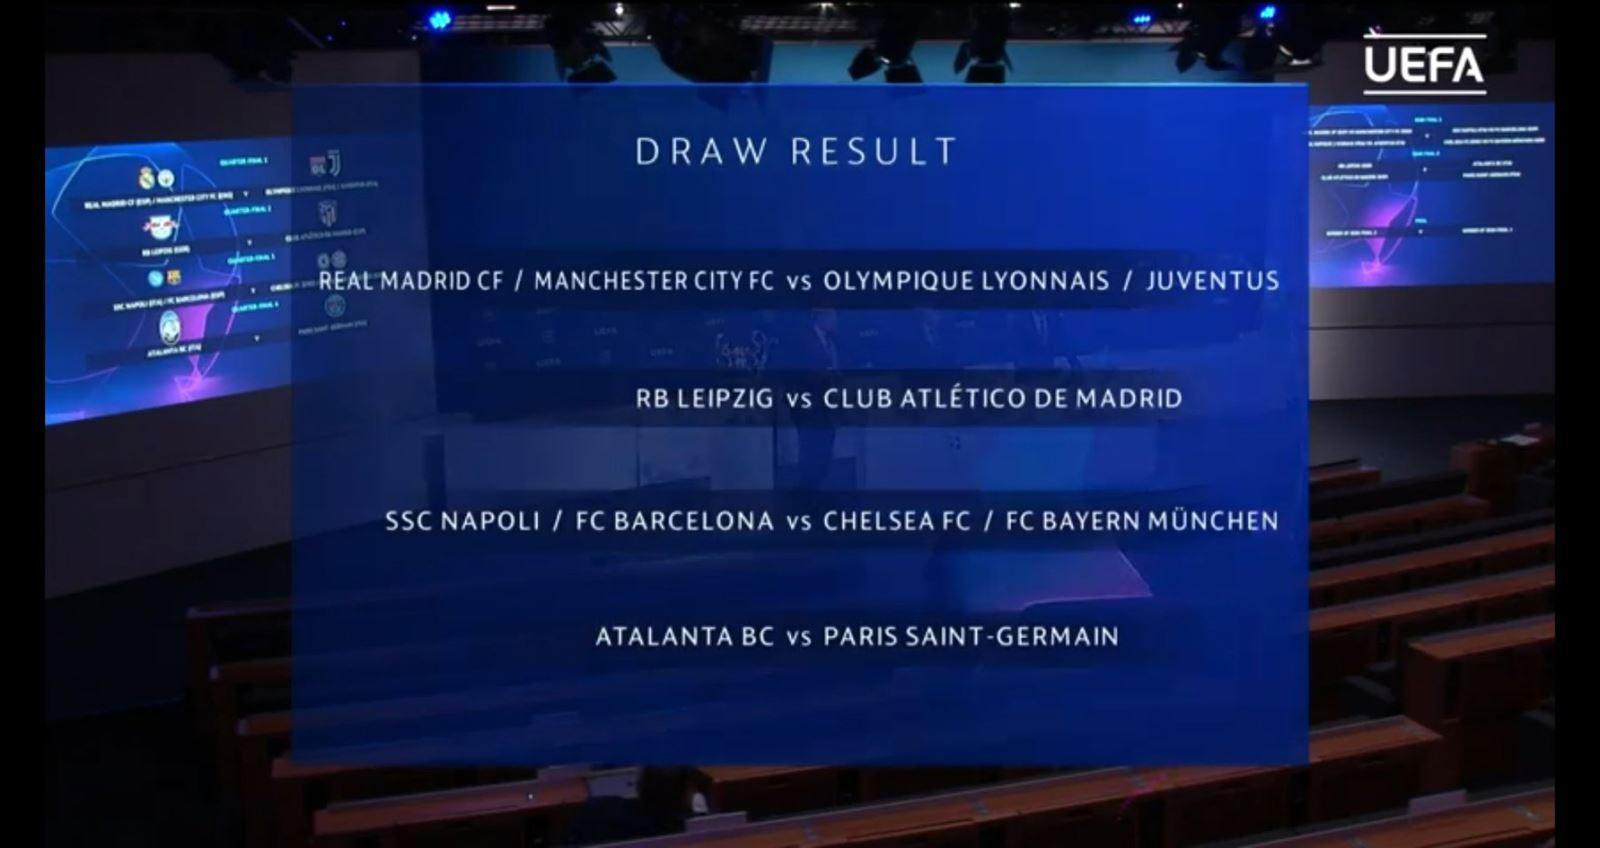 Ket qua boc tham C1, tứ kết cúp C1, Man City có thể gặp Juventus, Barca đối mặt Bayern, cúp C1 châu Âu, vòng tứ kết cúp C1, Champions League, Man City, Barcelona, Juve